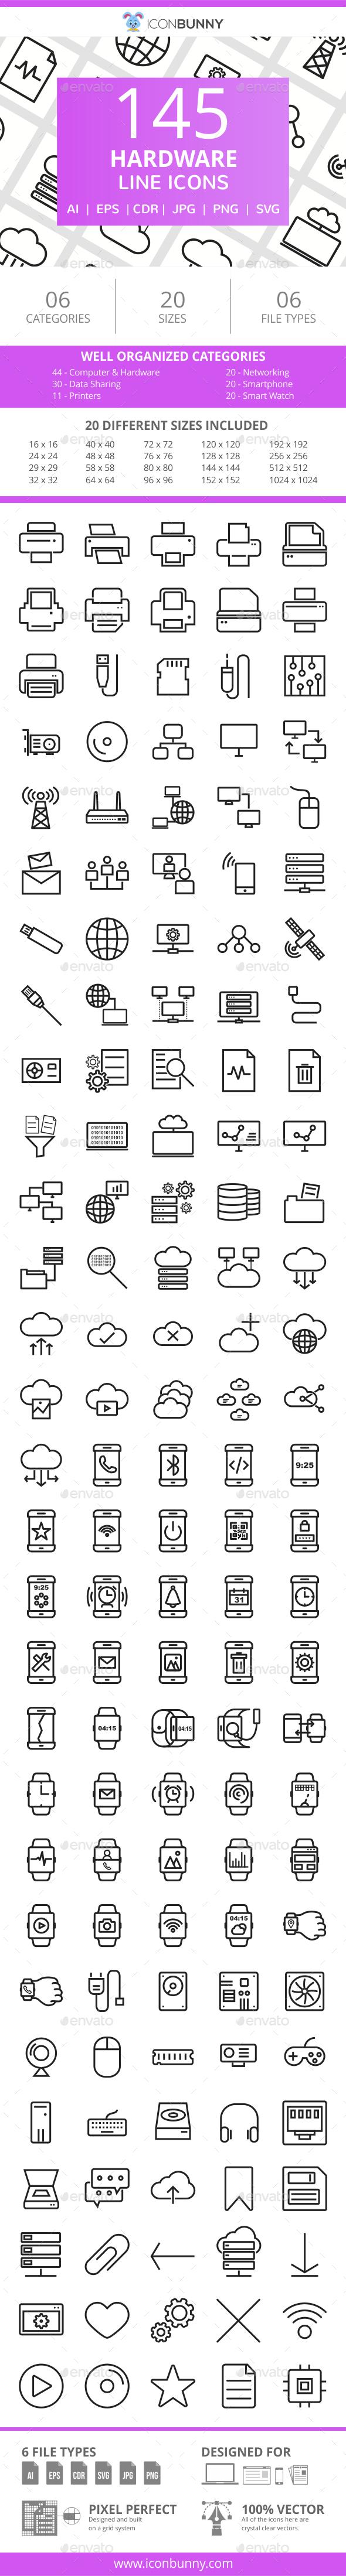 166 Hardware Line Icons - Icons